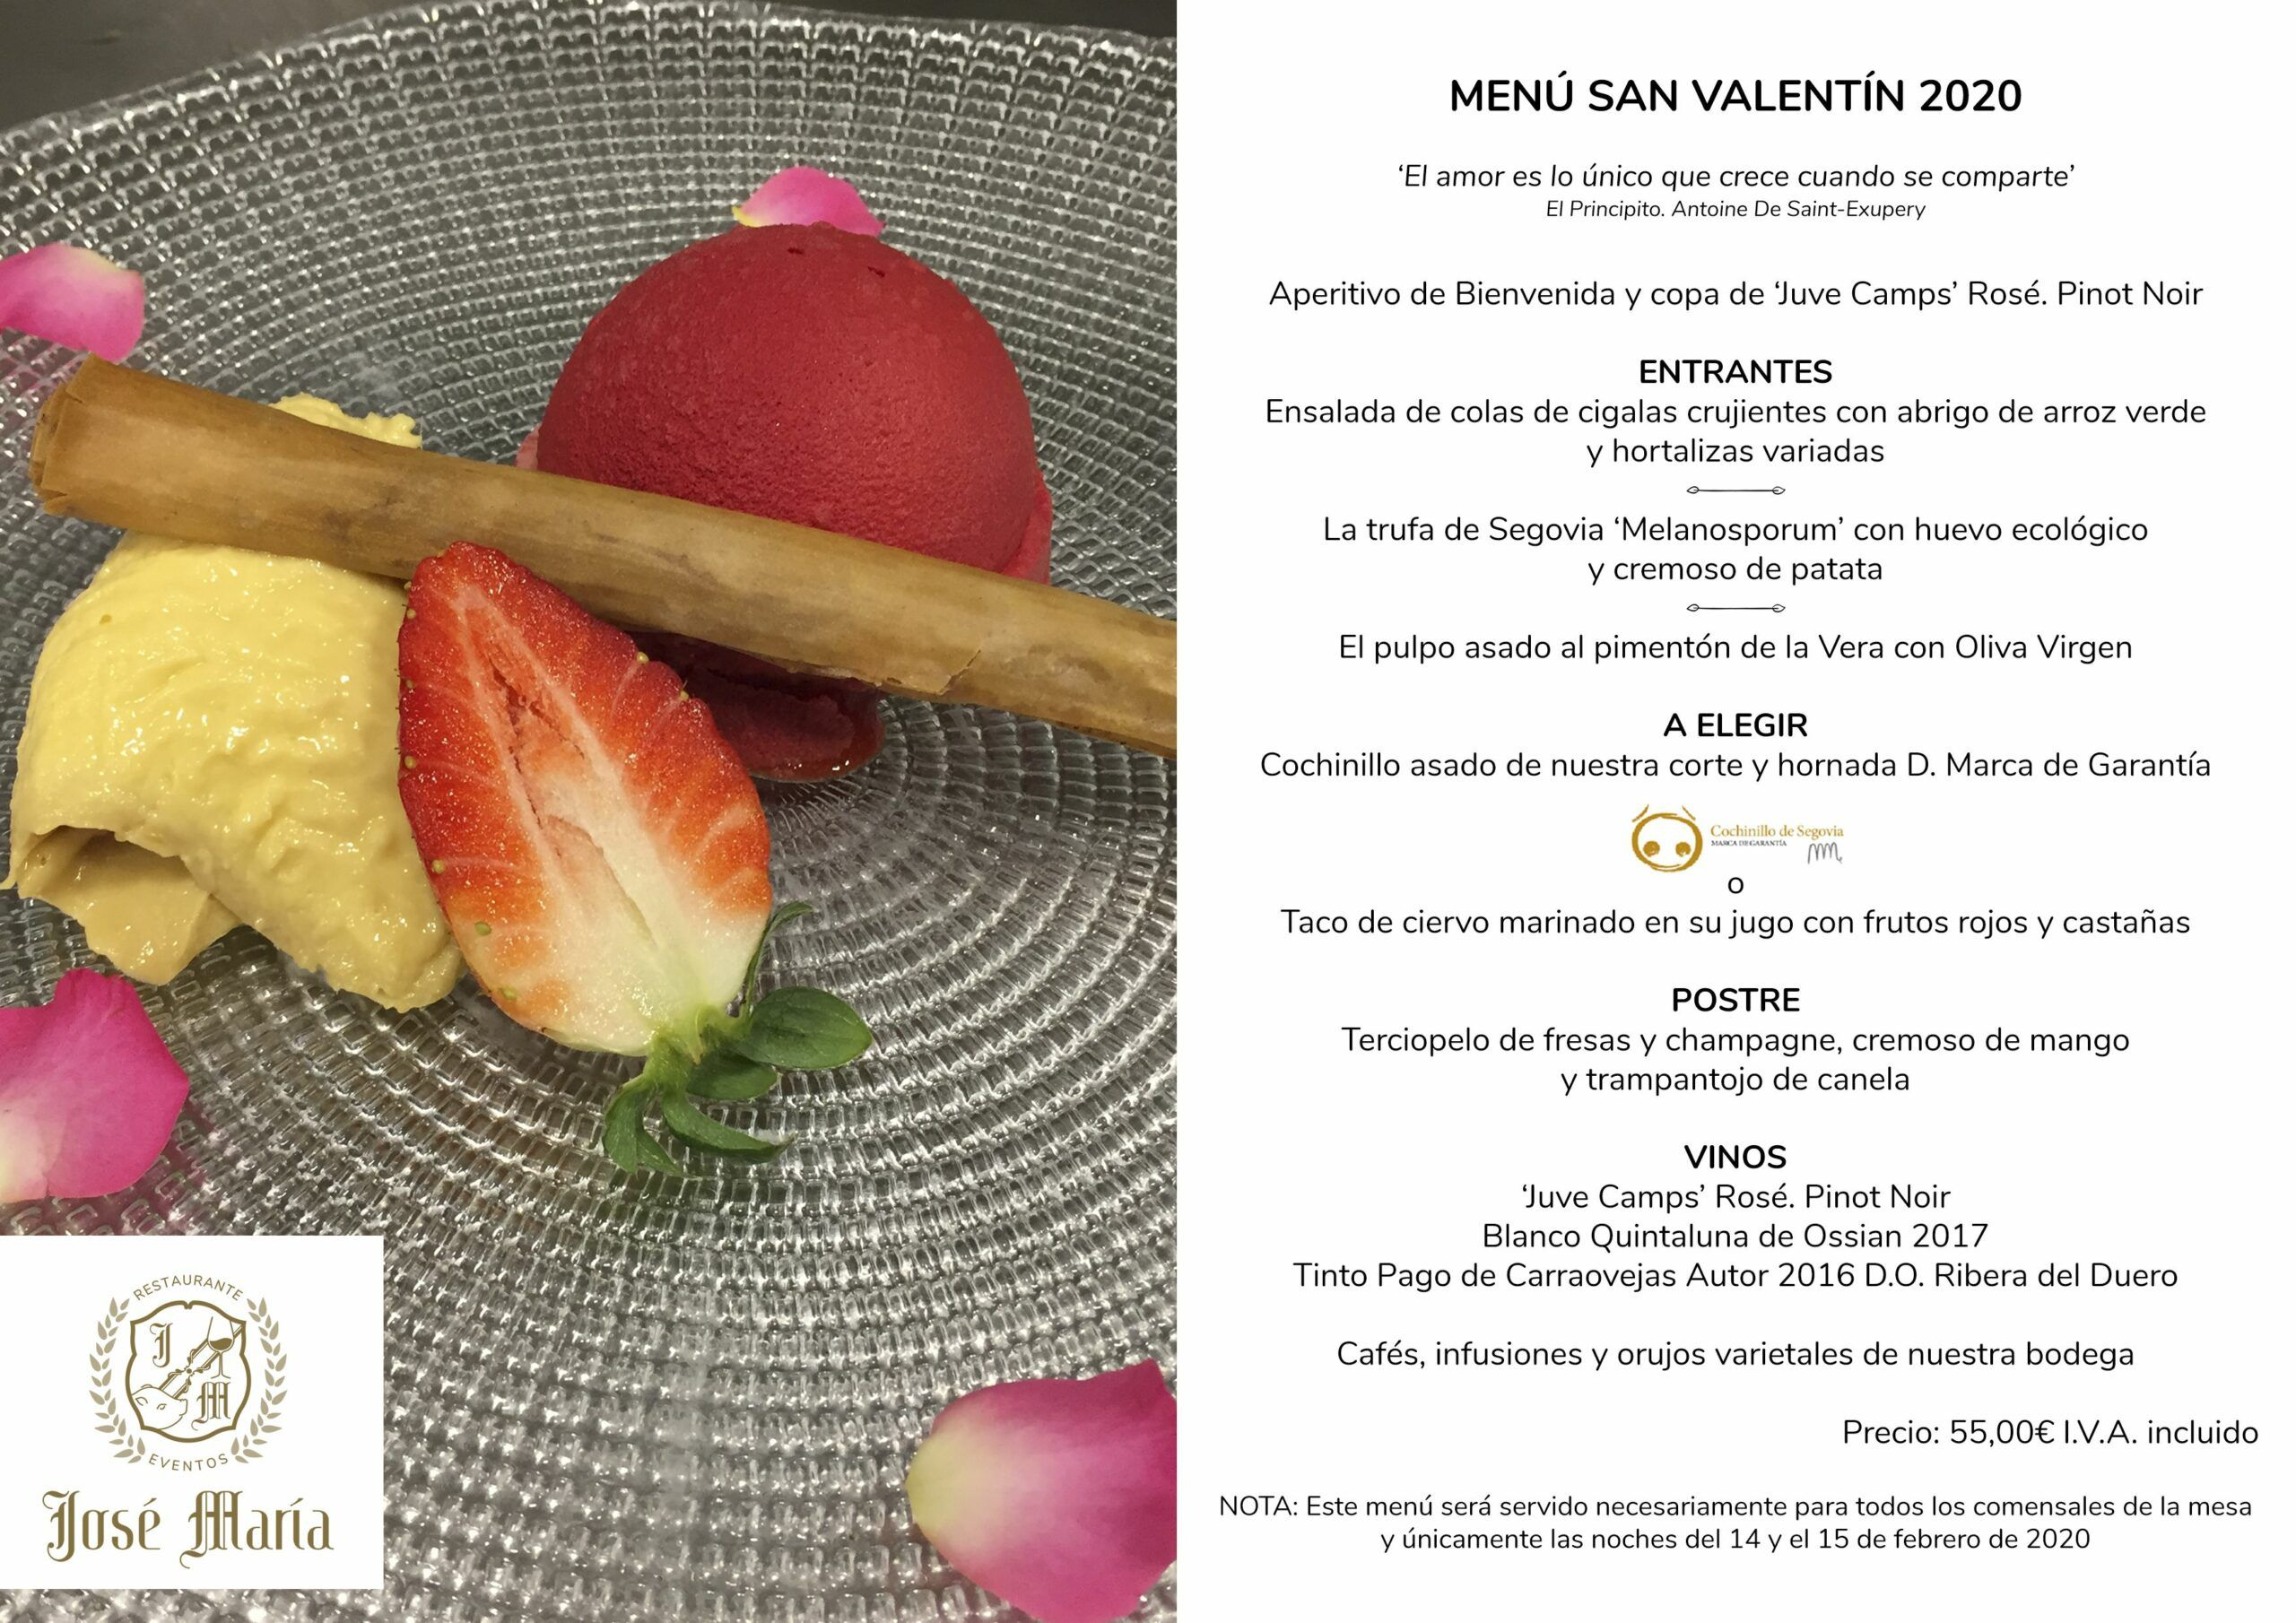 Menú San Valentín 2020